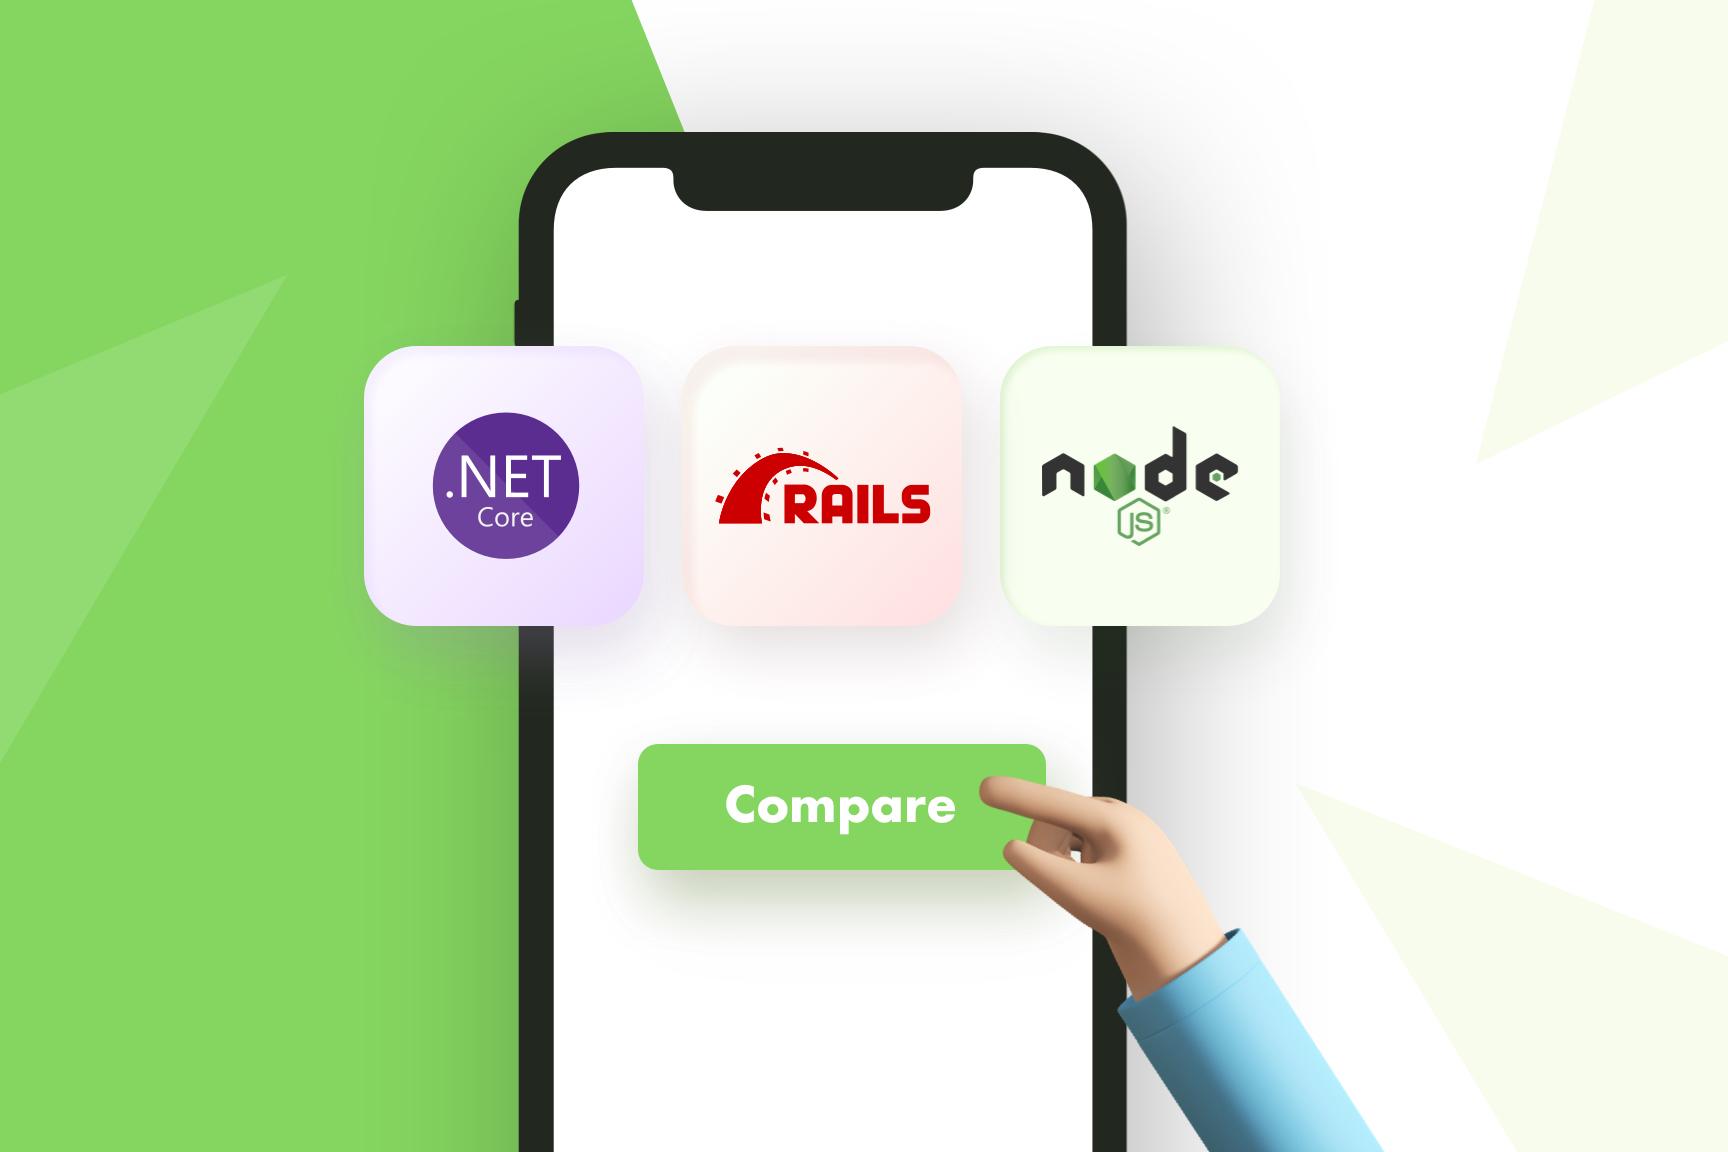 NET Core vs Node.js vs RoR